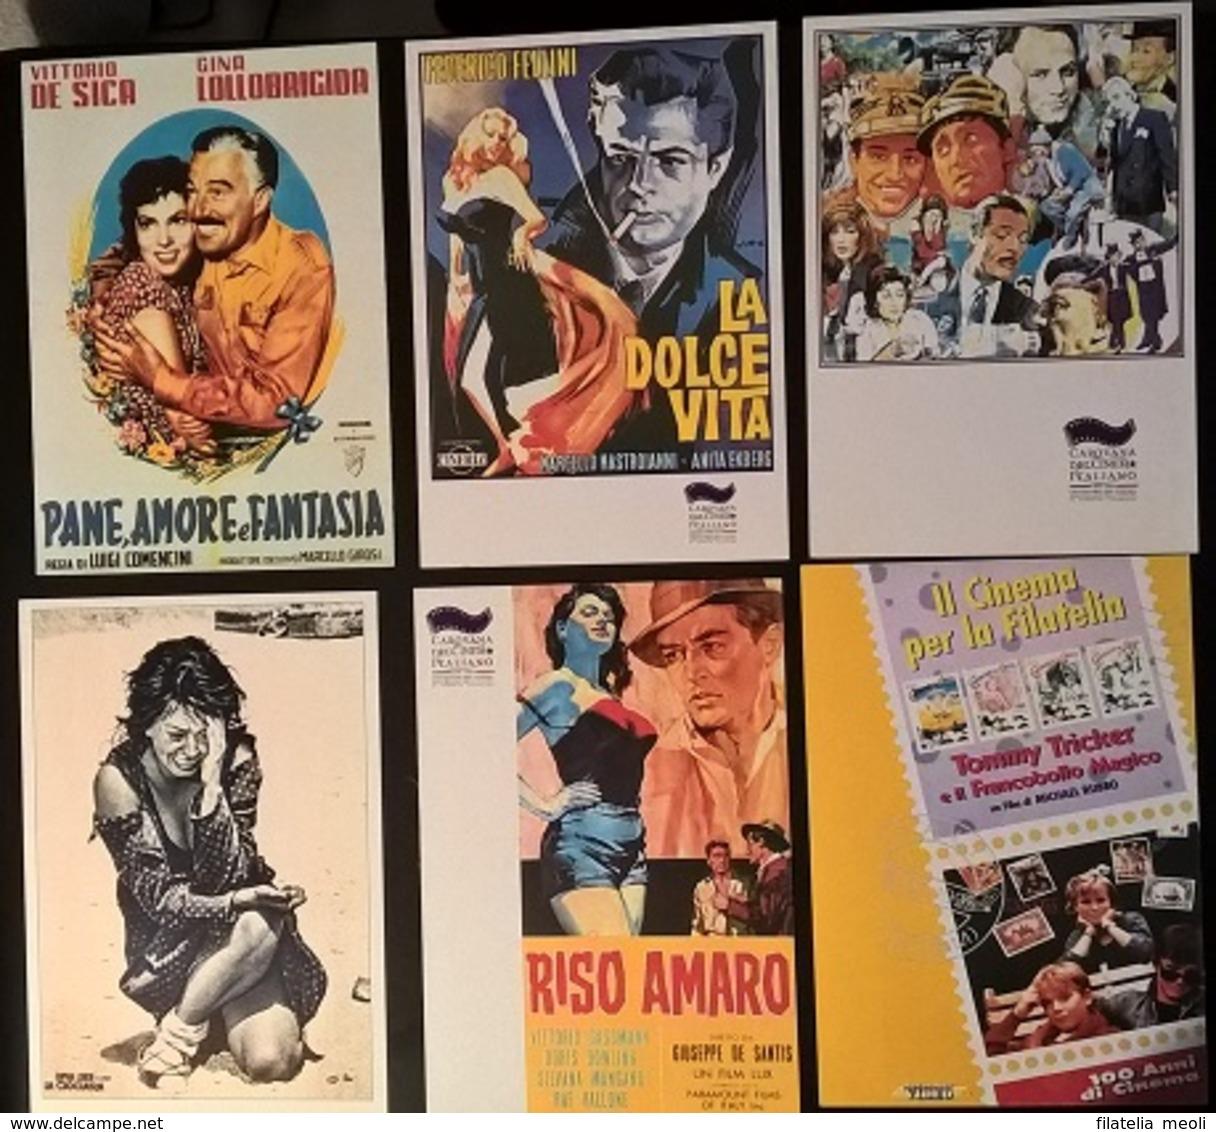 12 CARTOLINE CAROVANA DEL CINEMA - Cinemania